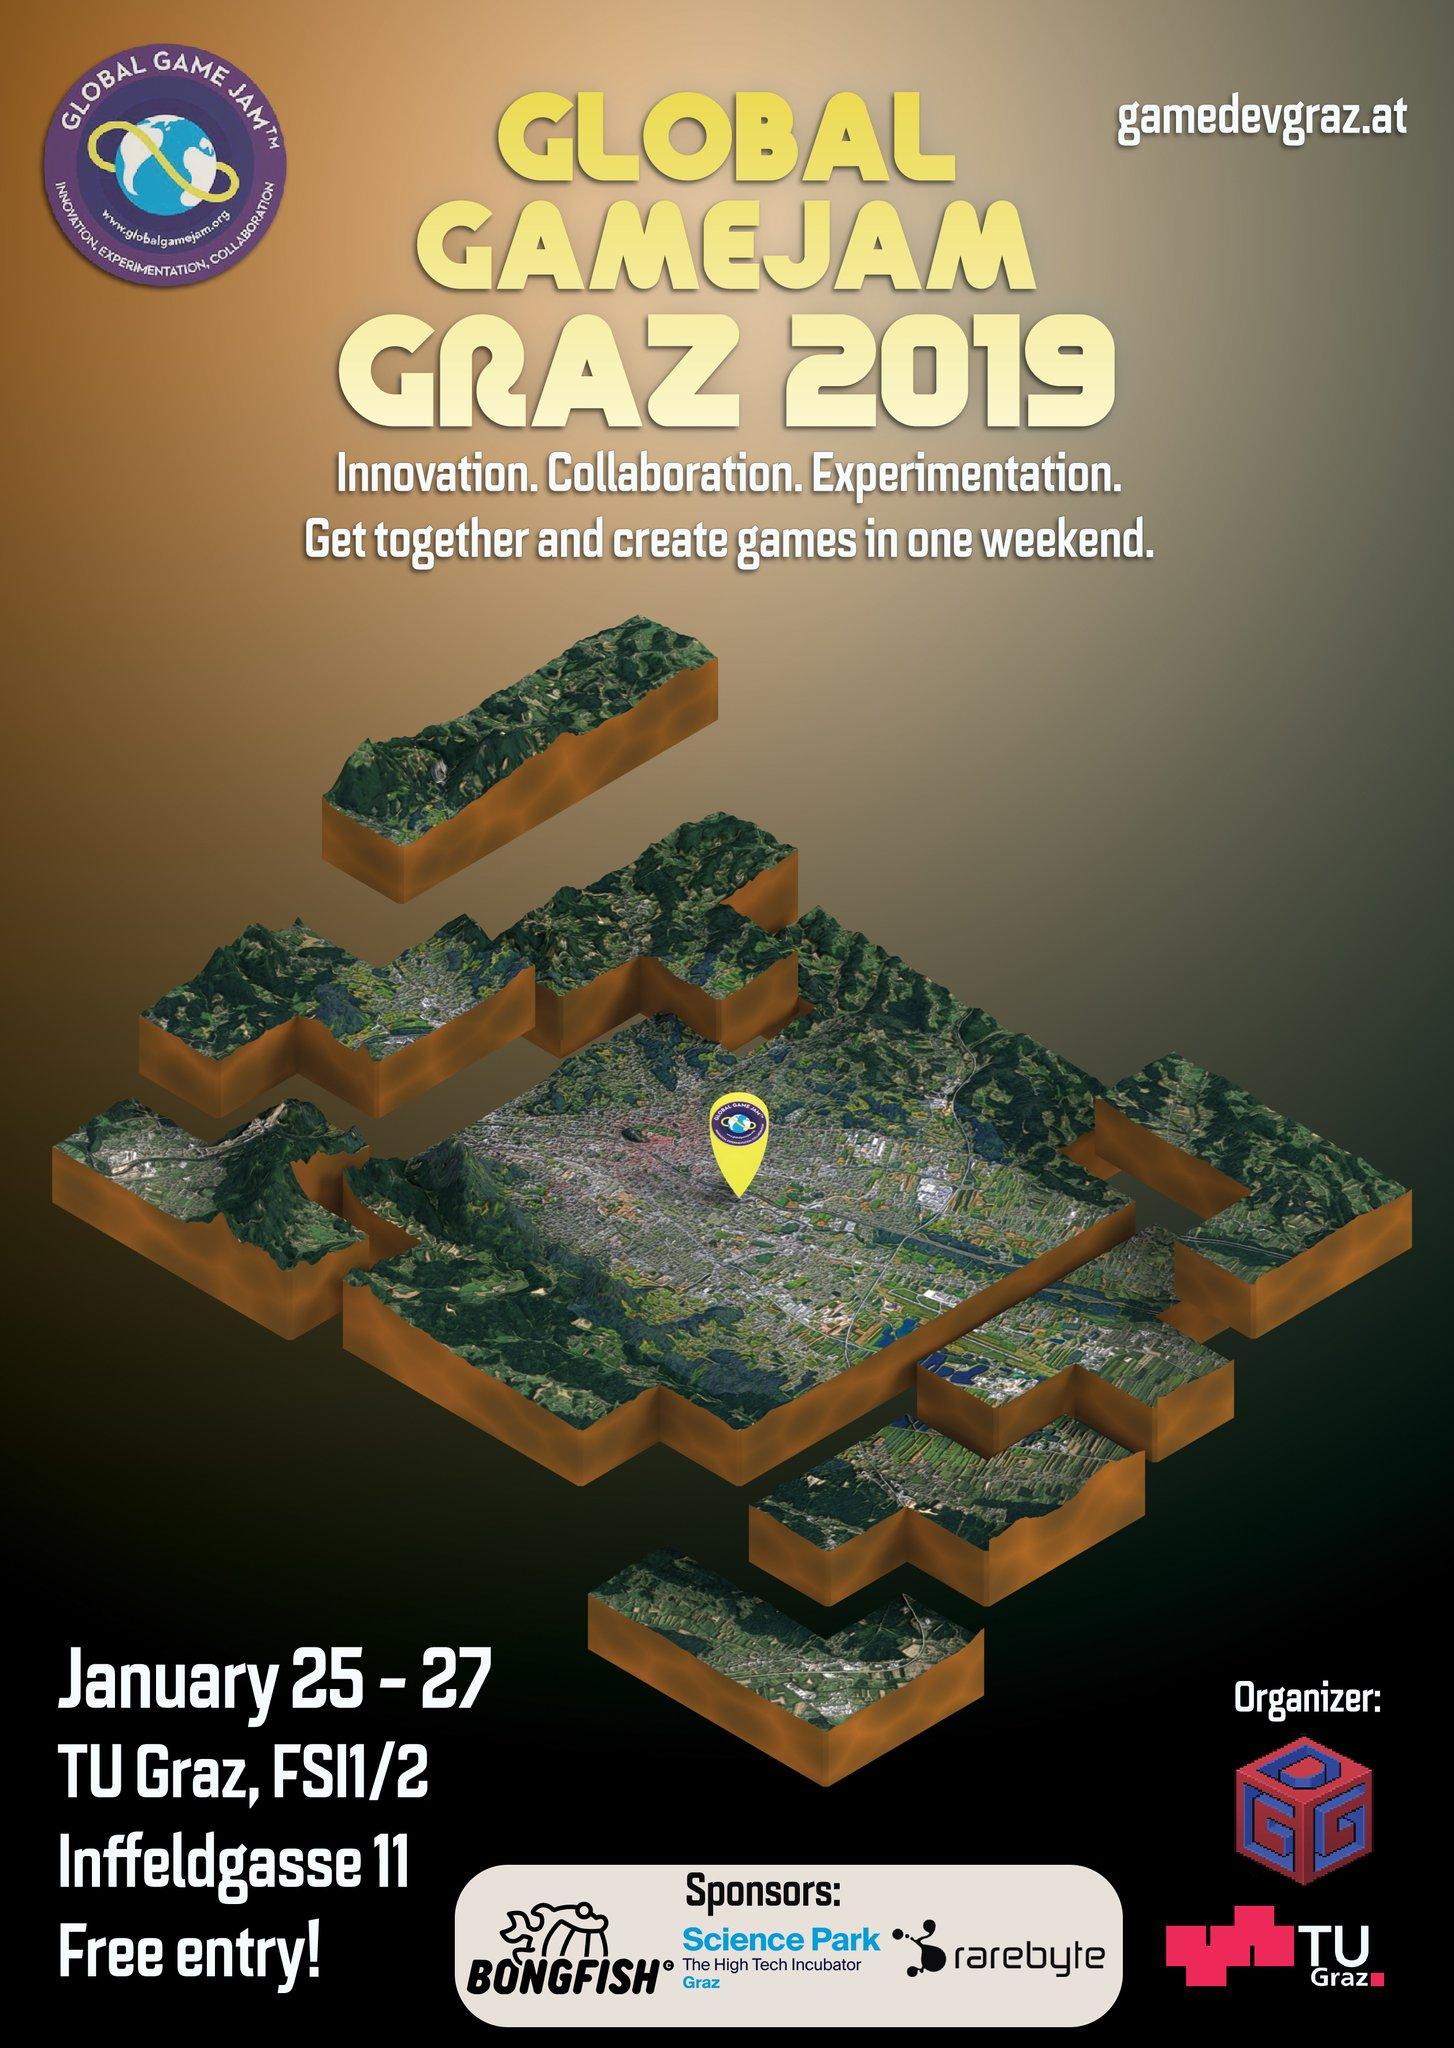 Global Game Jam 2019 – Game Development Graz